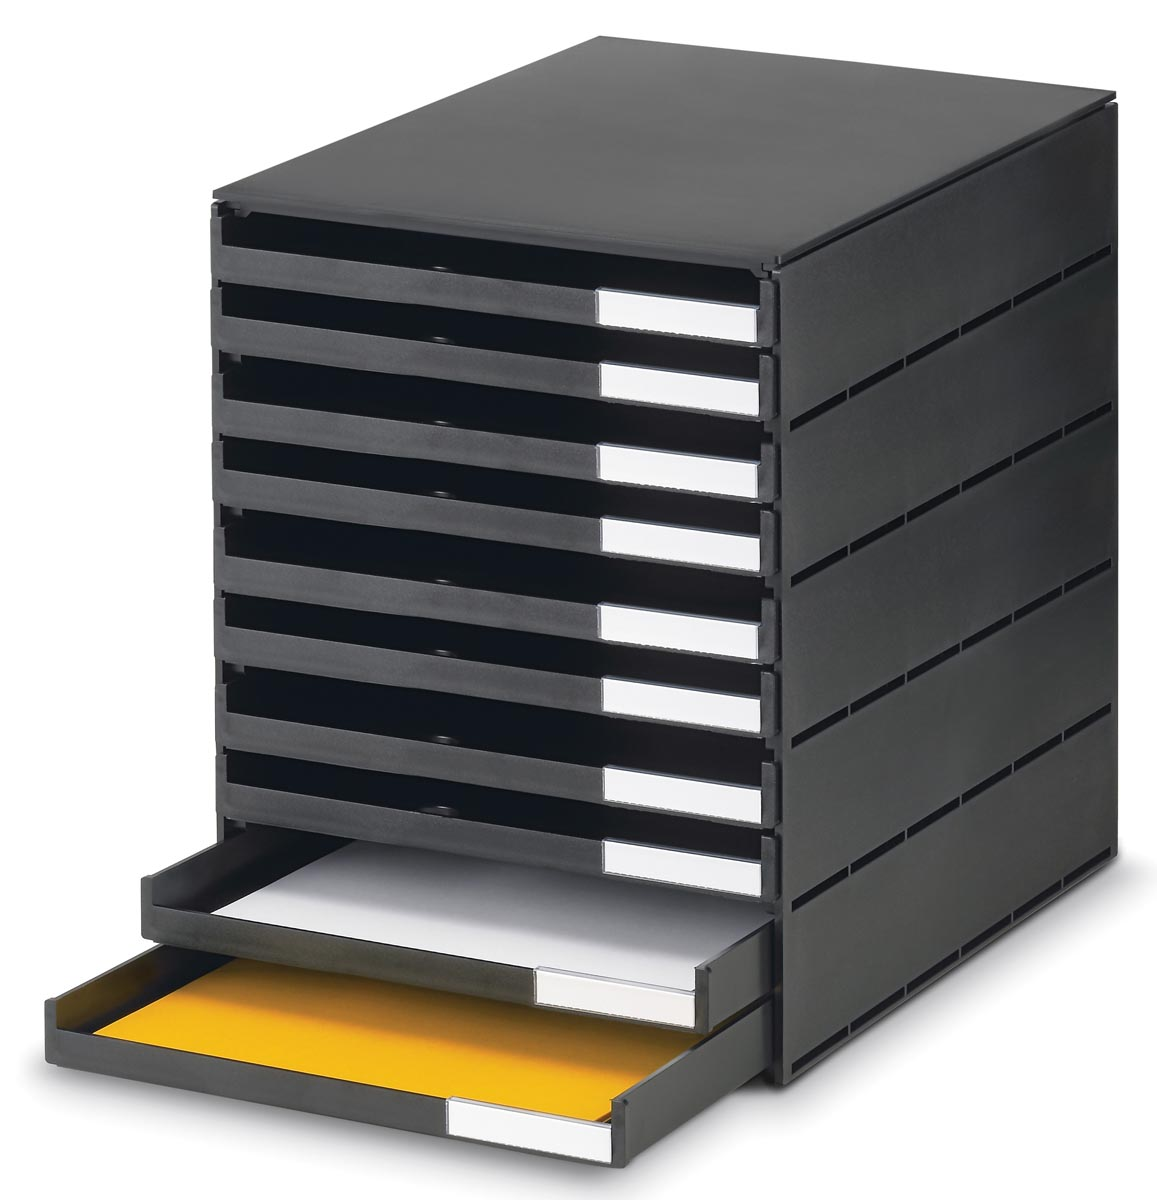 Styro ladenblok Styroval met 10 open laden, zwart